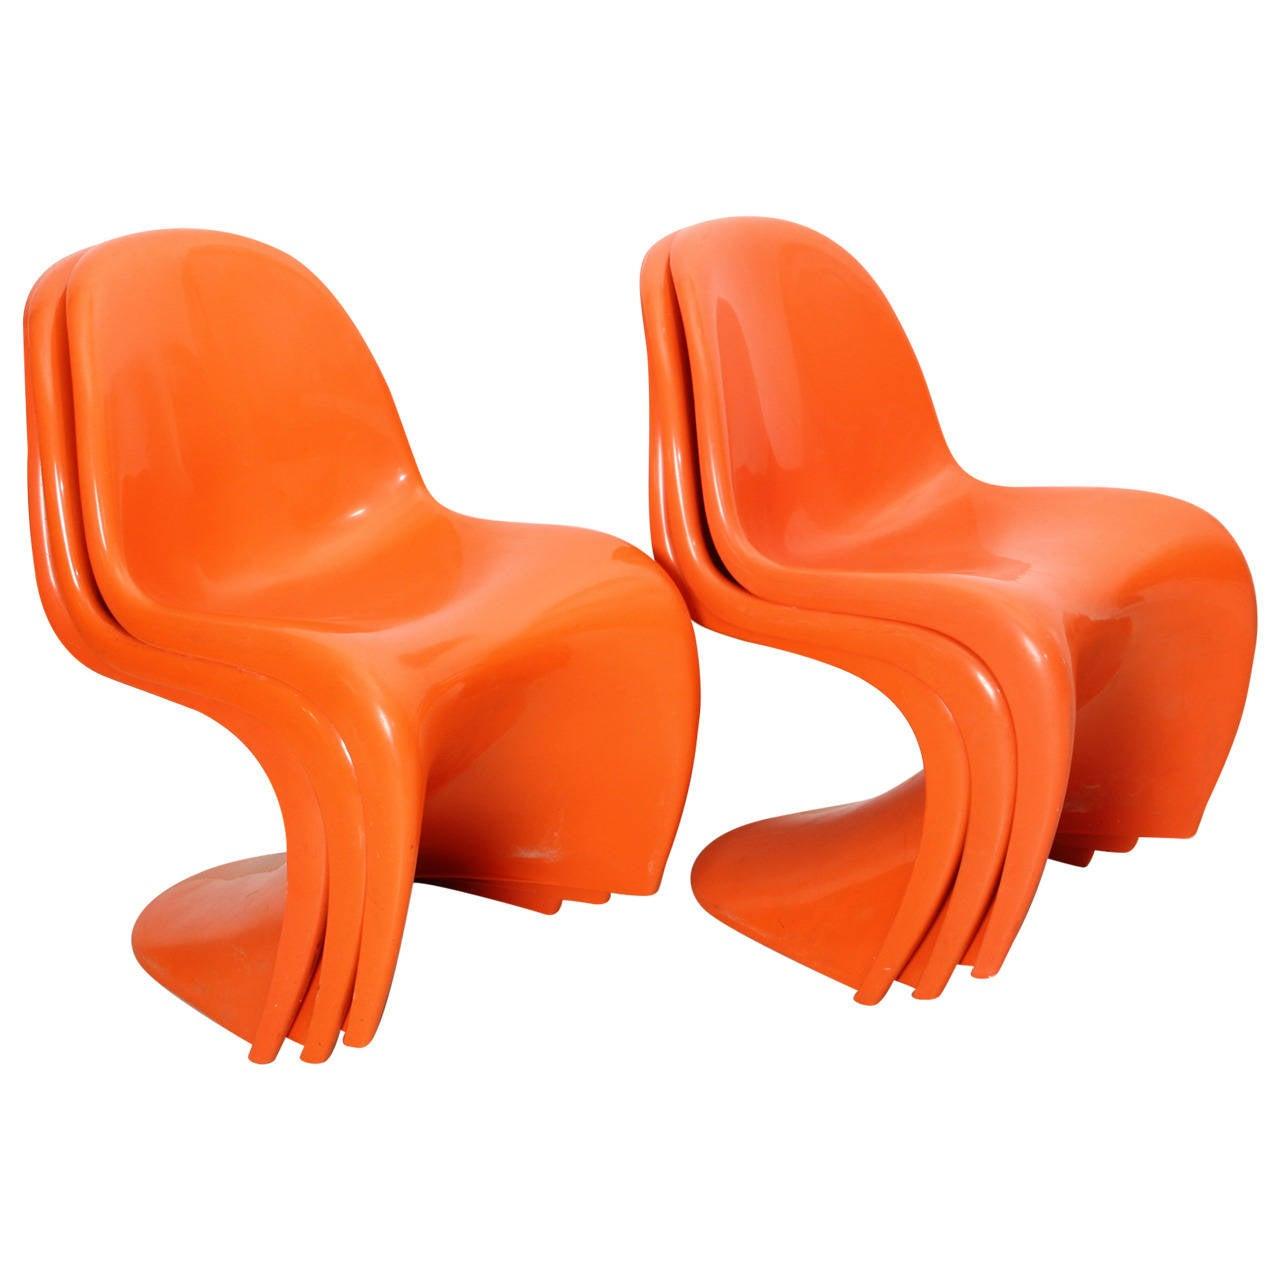 6 panton chairs by verner panton edited by herman miller in 1960 at 1stdibs. Black Bedroom Furniture Sets. Home Design Ideas